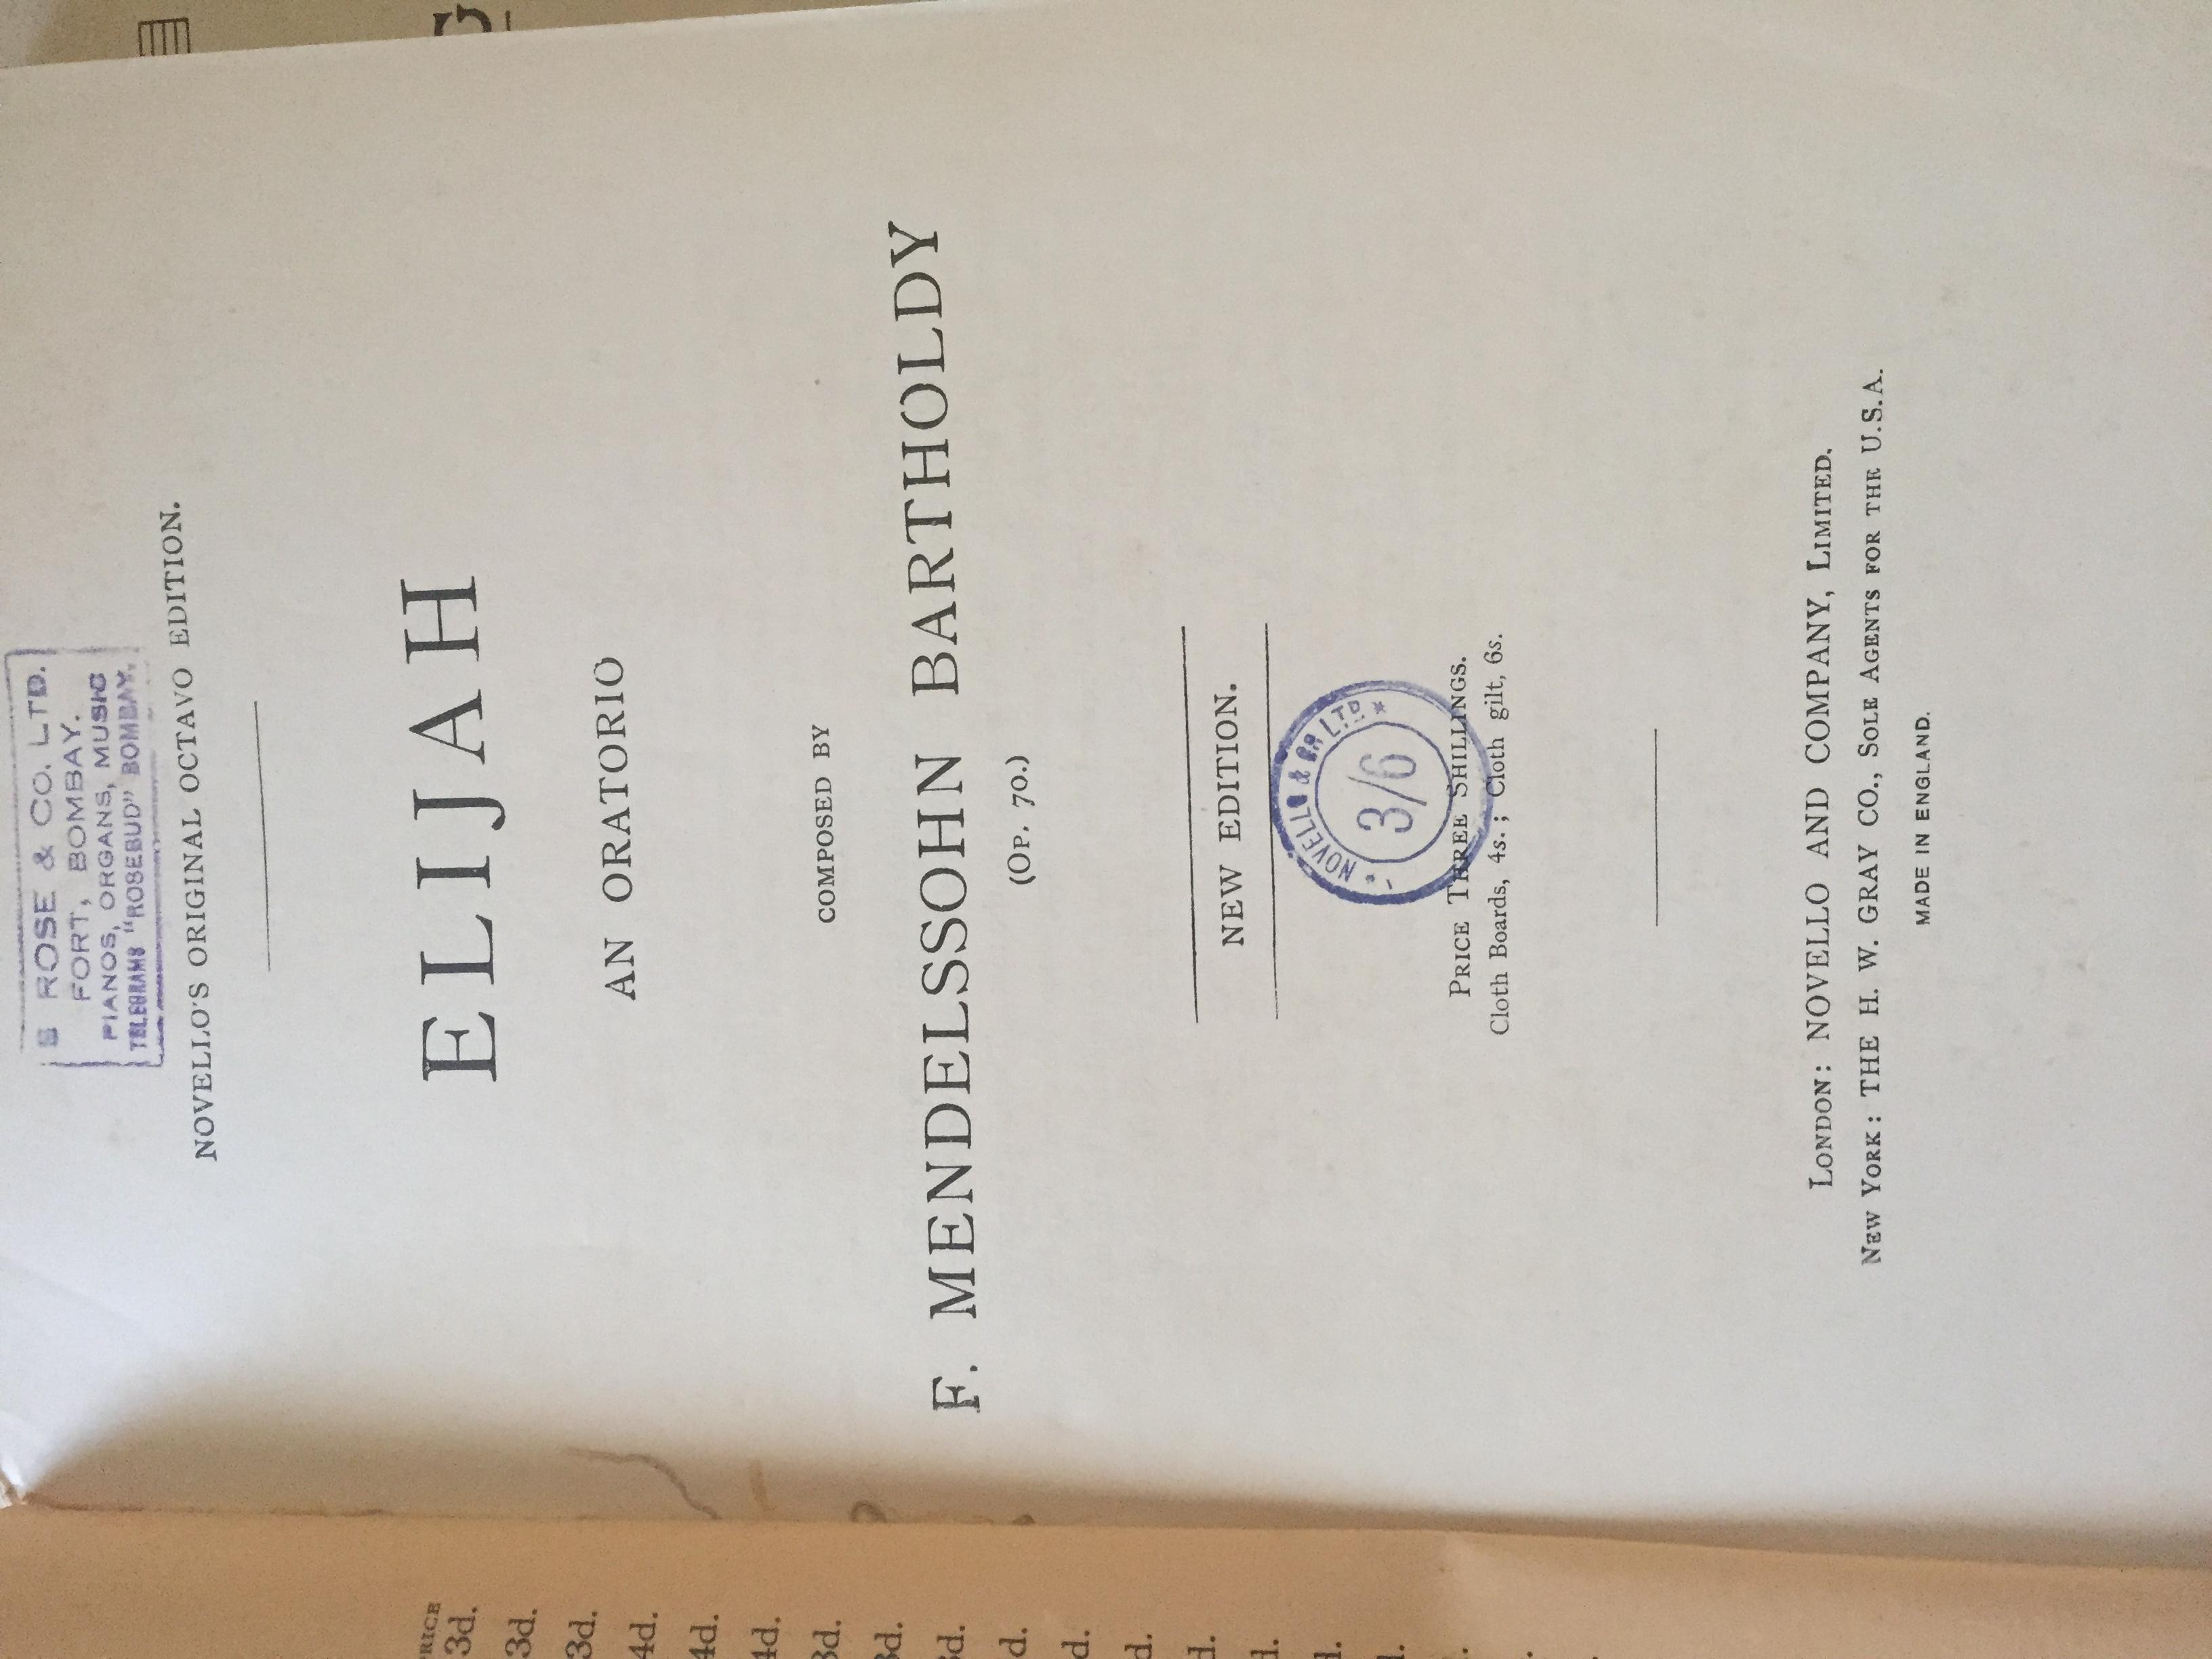 Drexel Esperanto Dining Set Antique Appraisal Instappraisal